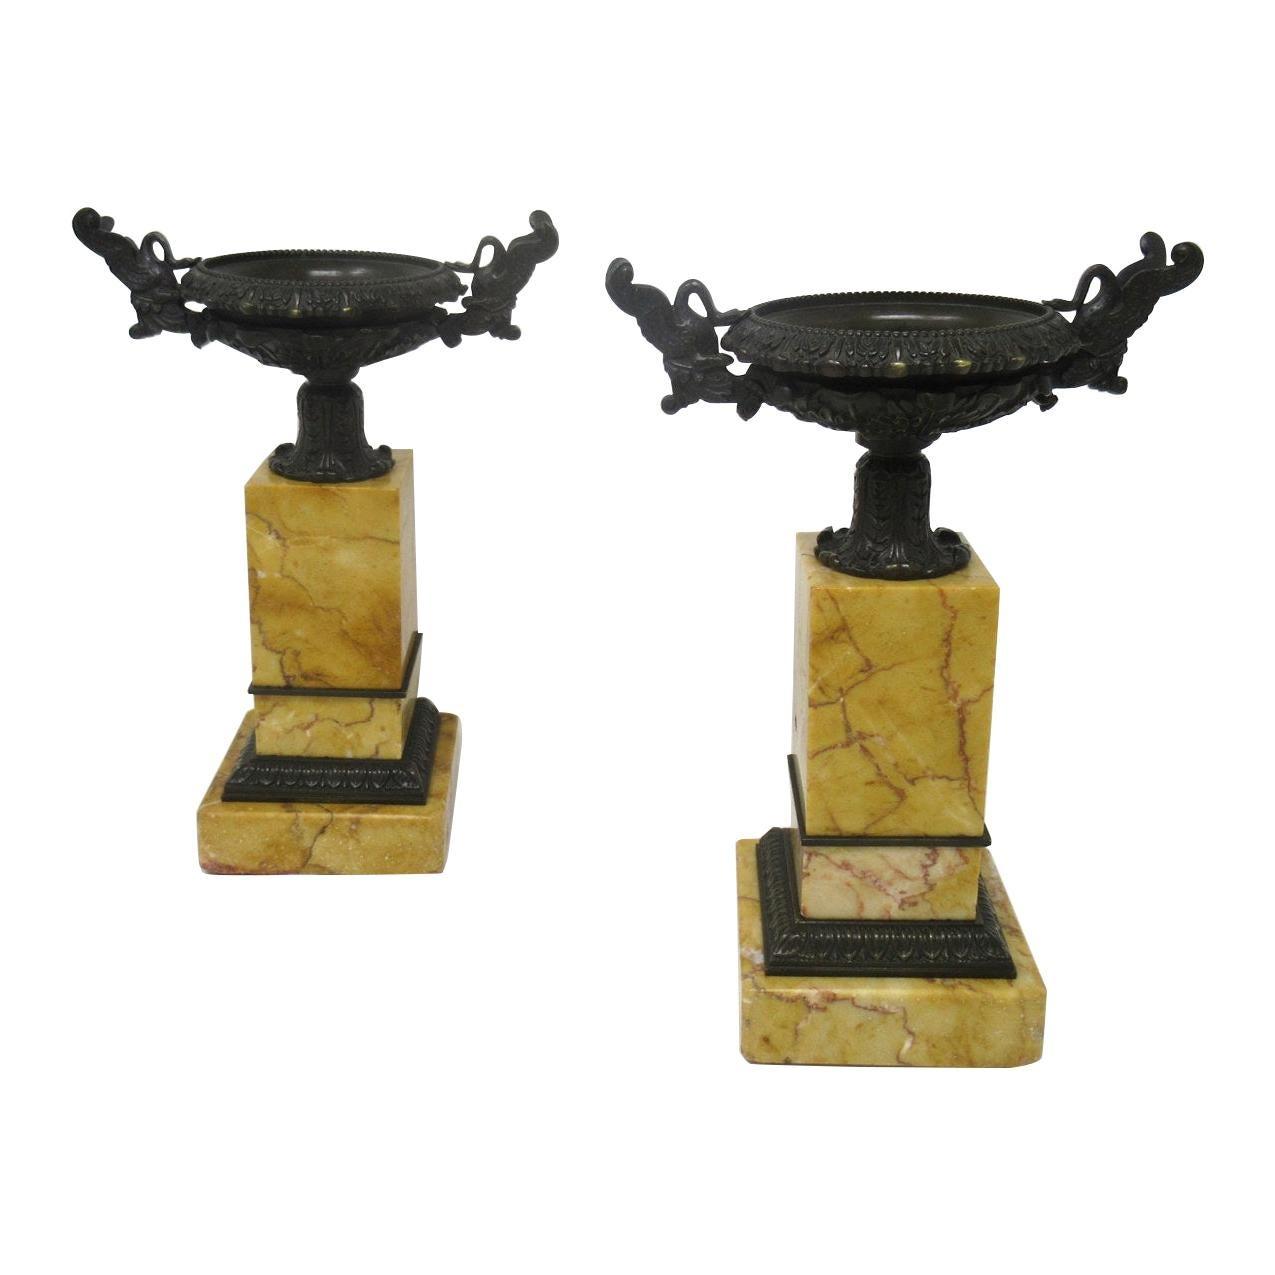 Antique Pair of Grand Tour Empire Bronze Dore Sienna Marble Tazza Urns Vases